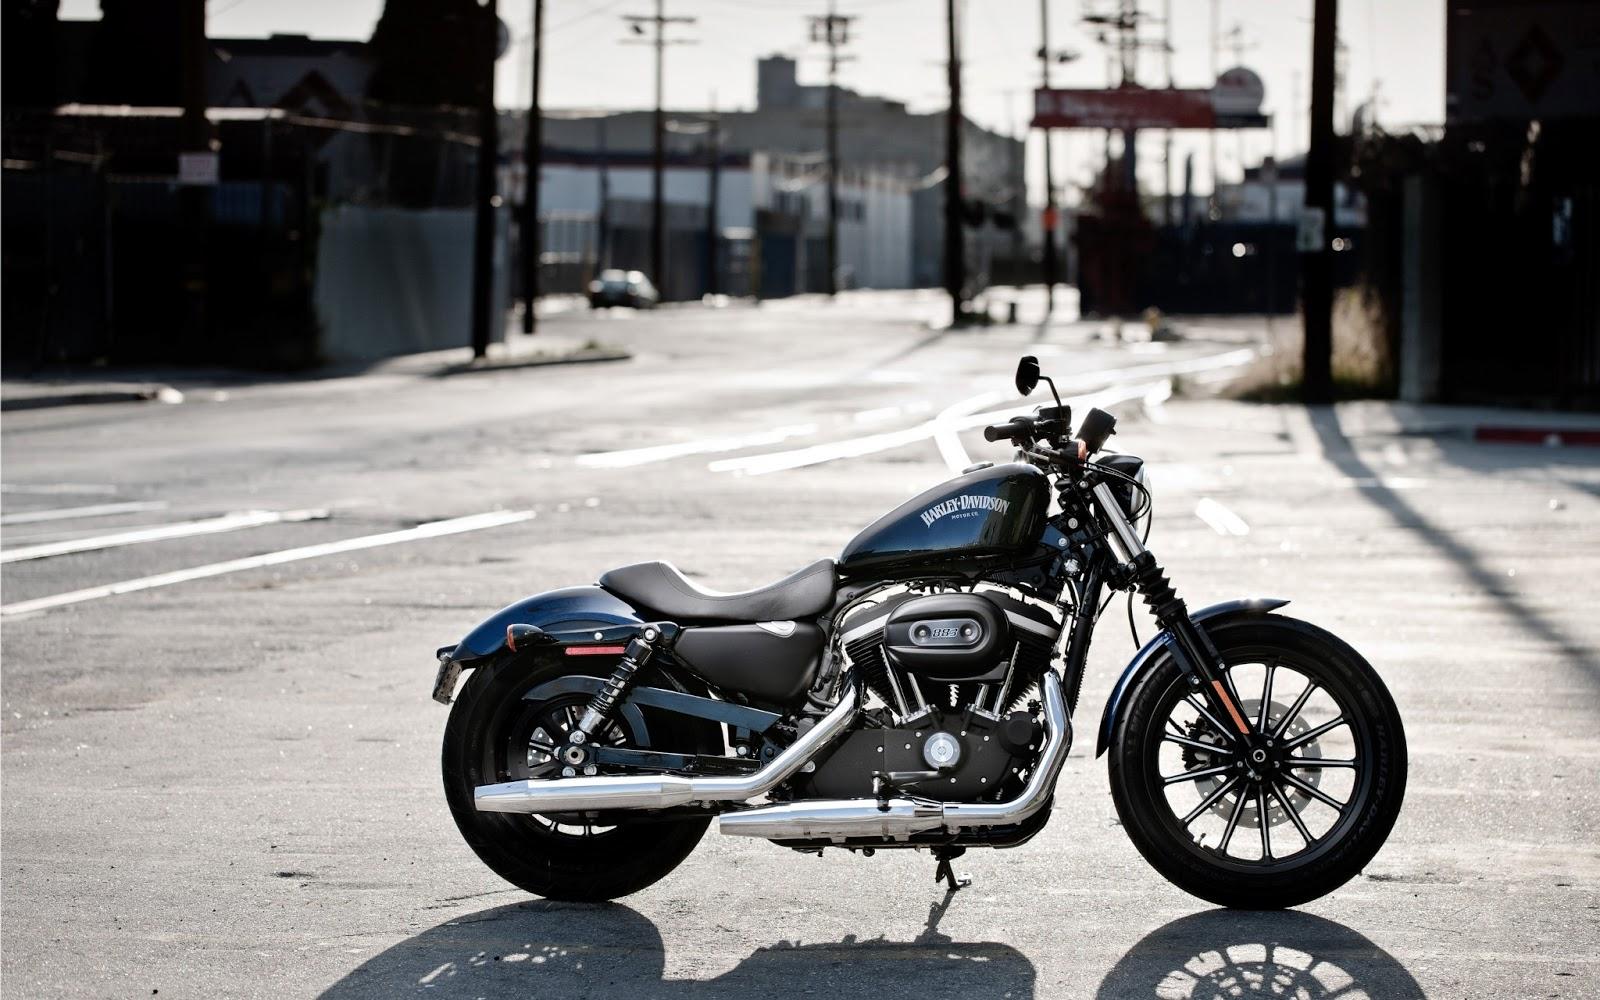 Harley Davidson Photos Download Wallpapers 1600x1000